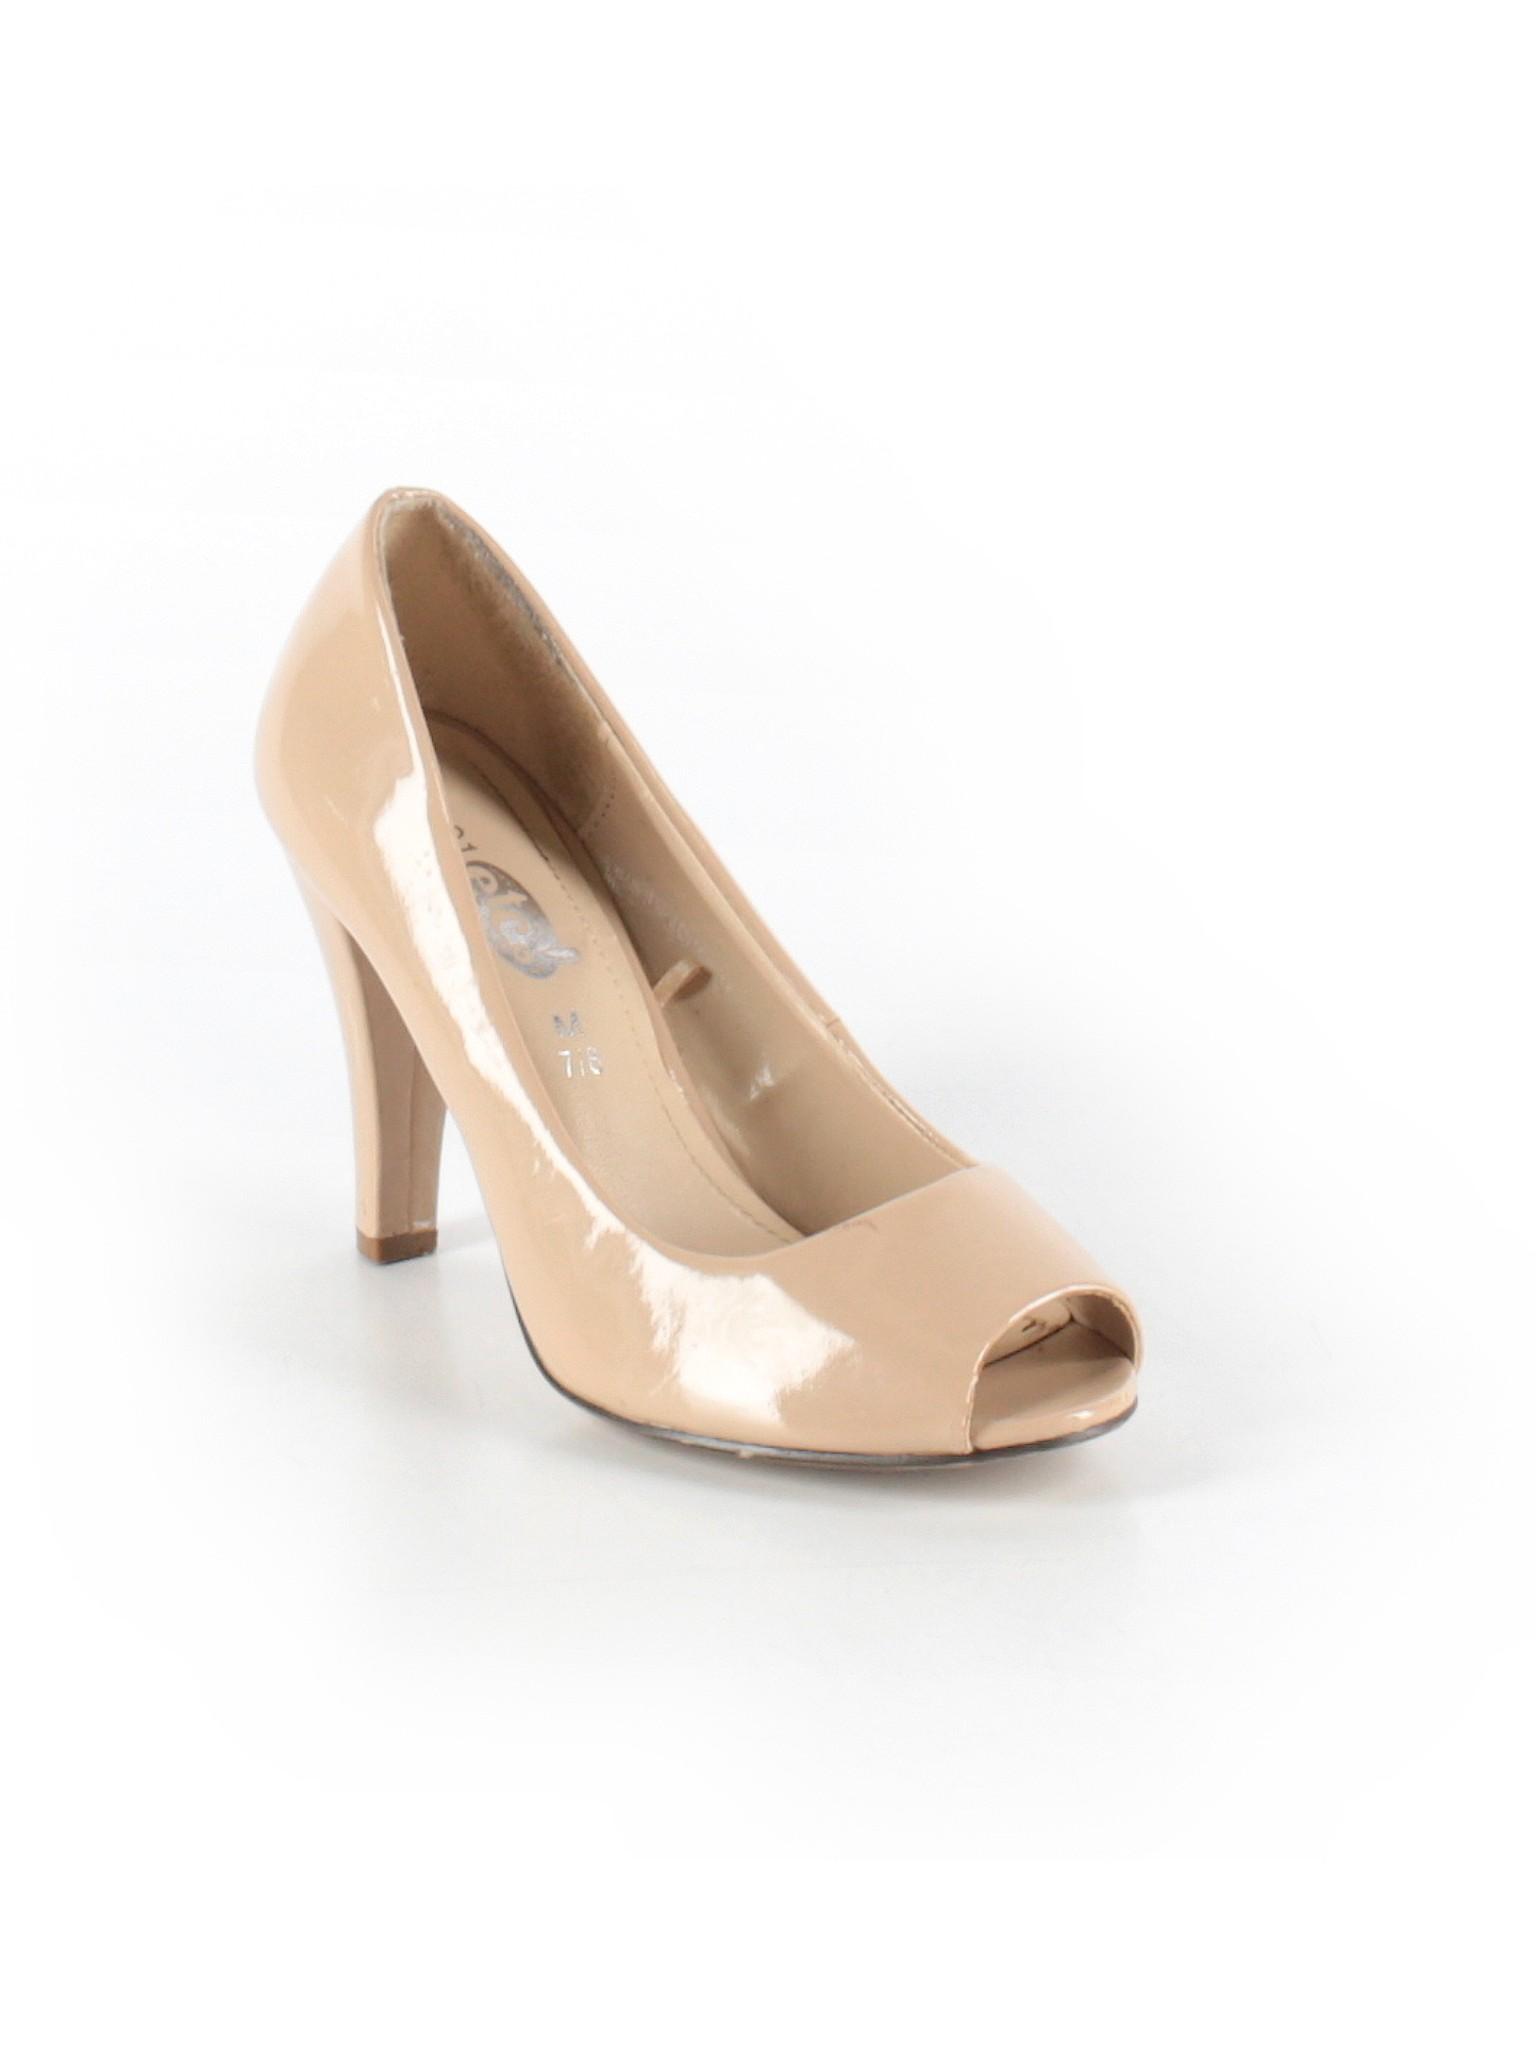 rue21 rue21 Boutique promotion Heels Heels Boutique promotion Boutique promotion qwFECv46